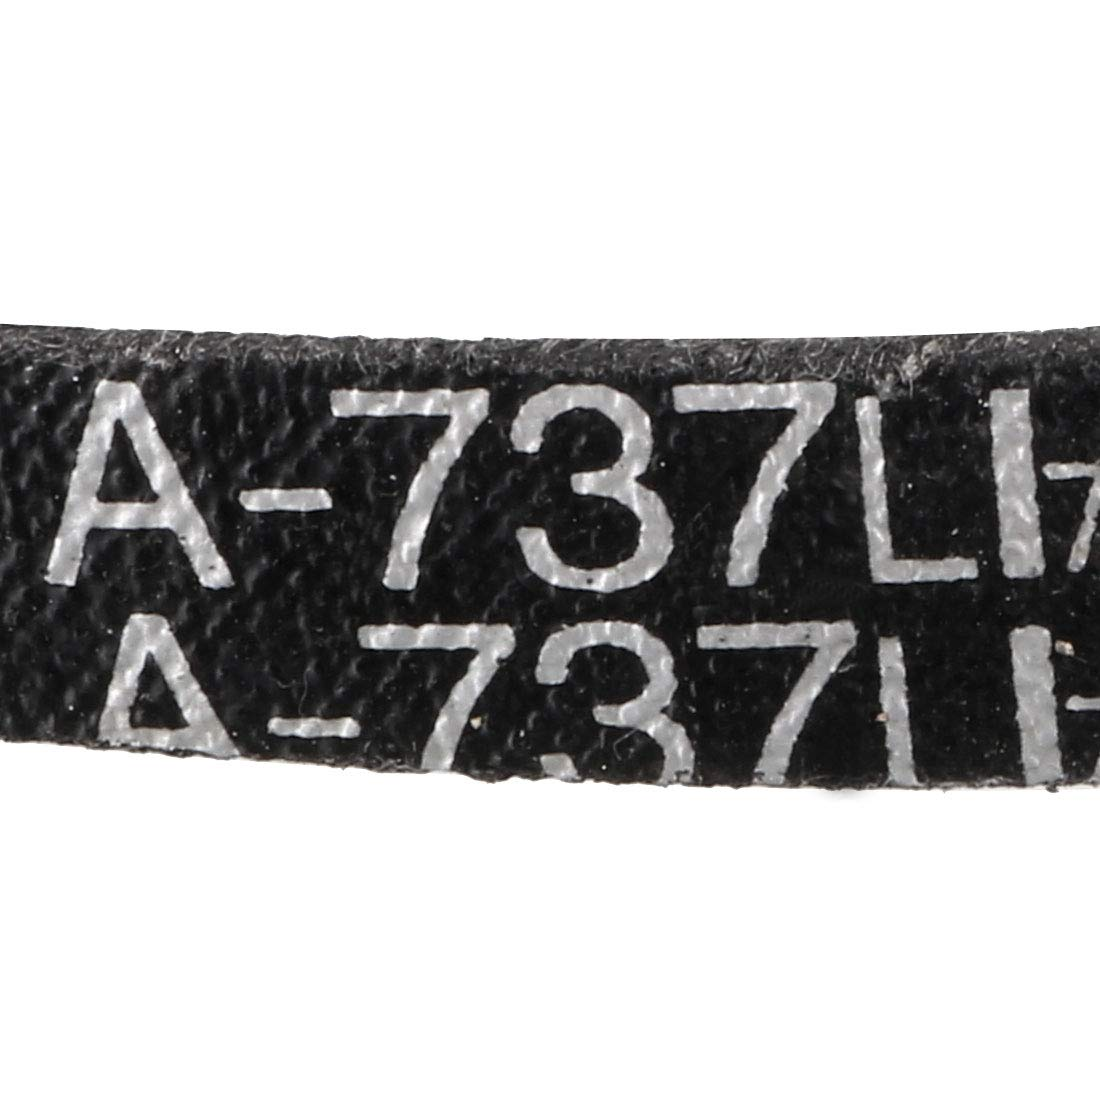 uxcell/® A-965 A38 V Belt Machine Transmission Rubber Replacement Drive Belt Black